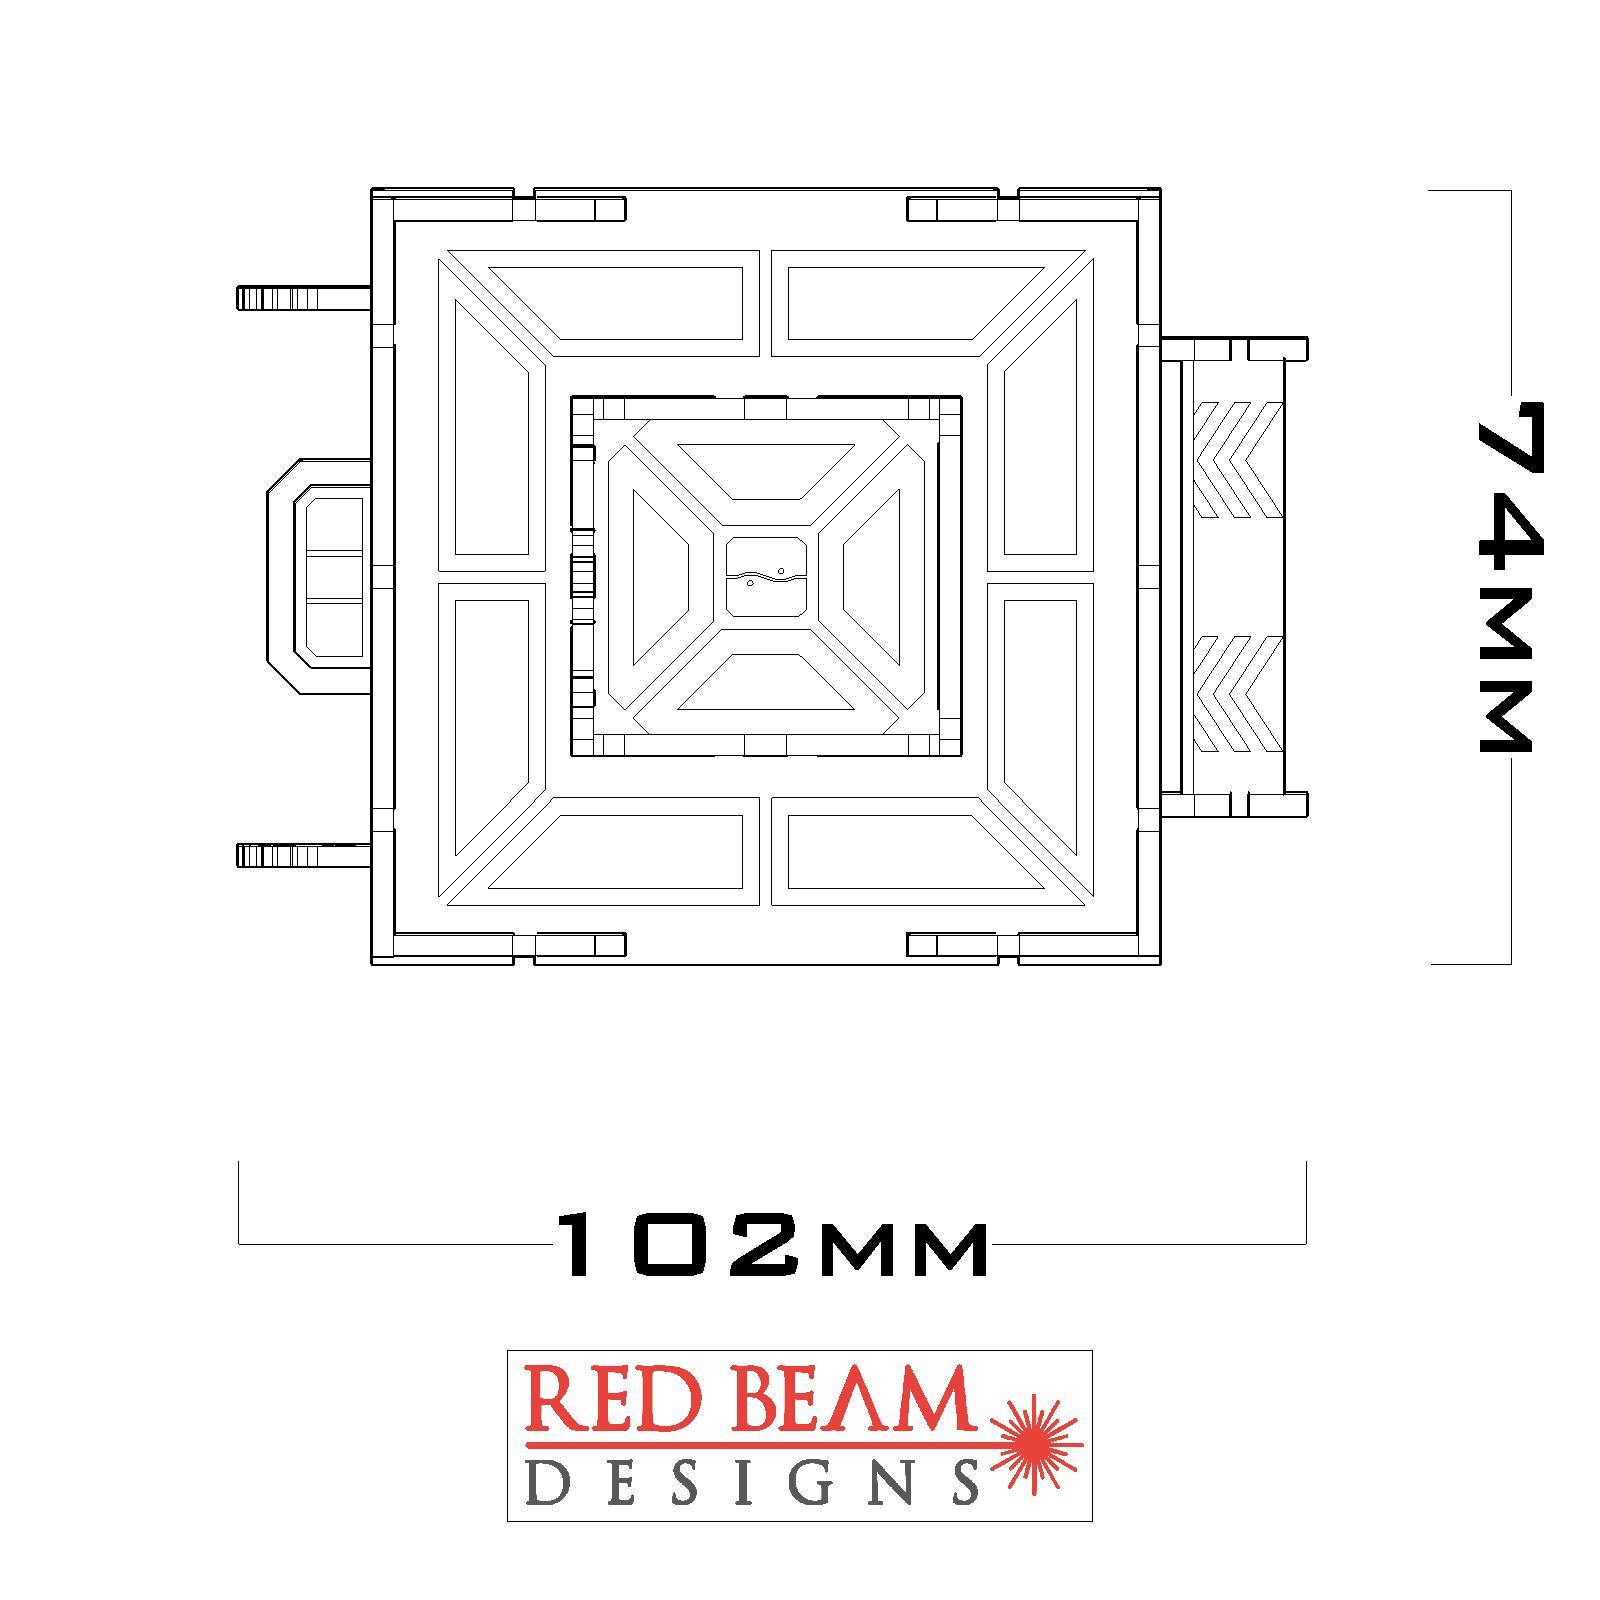 RBD091002_RENDER009.jpg